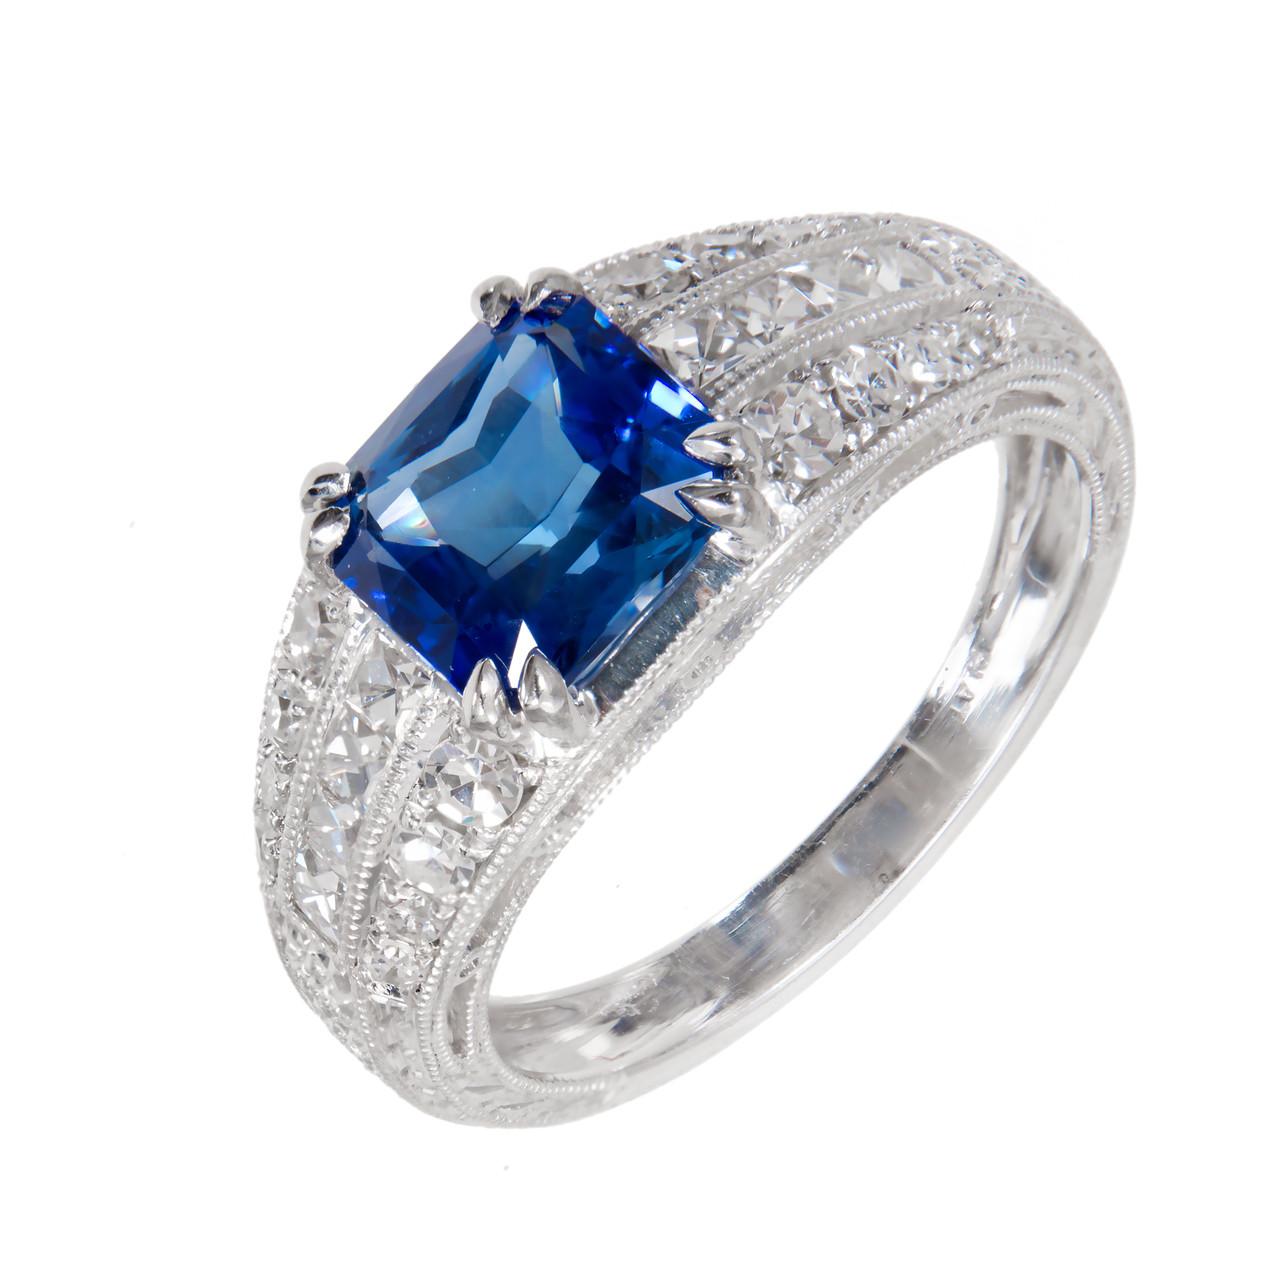 99170ff30 Peter Suchy Square Cornflower Blue Sapphire Engagement Ring Platinum Diamond  - petersuchyjewelers